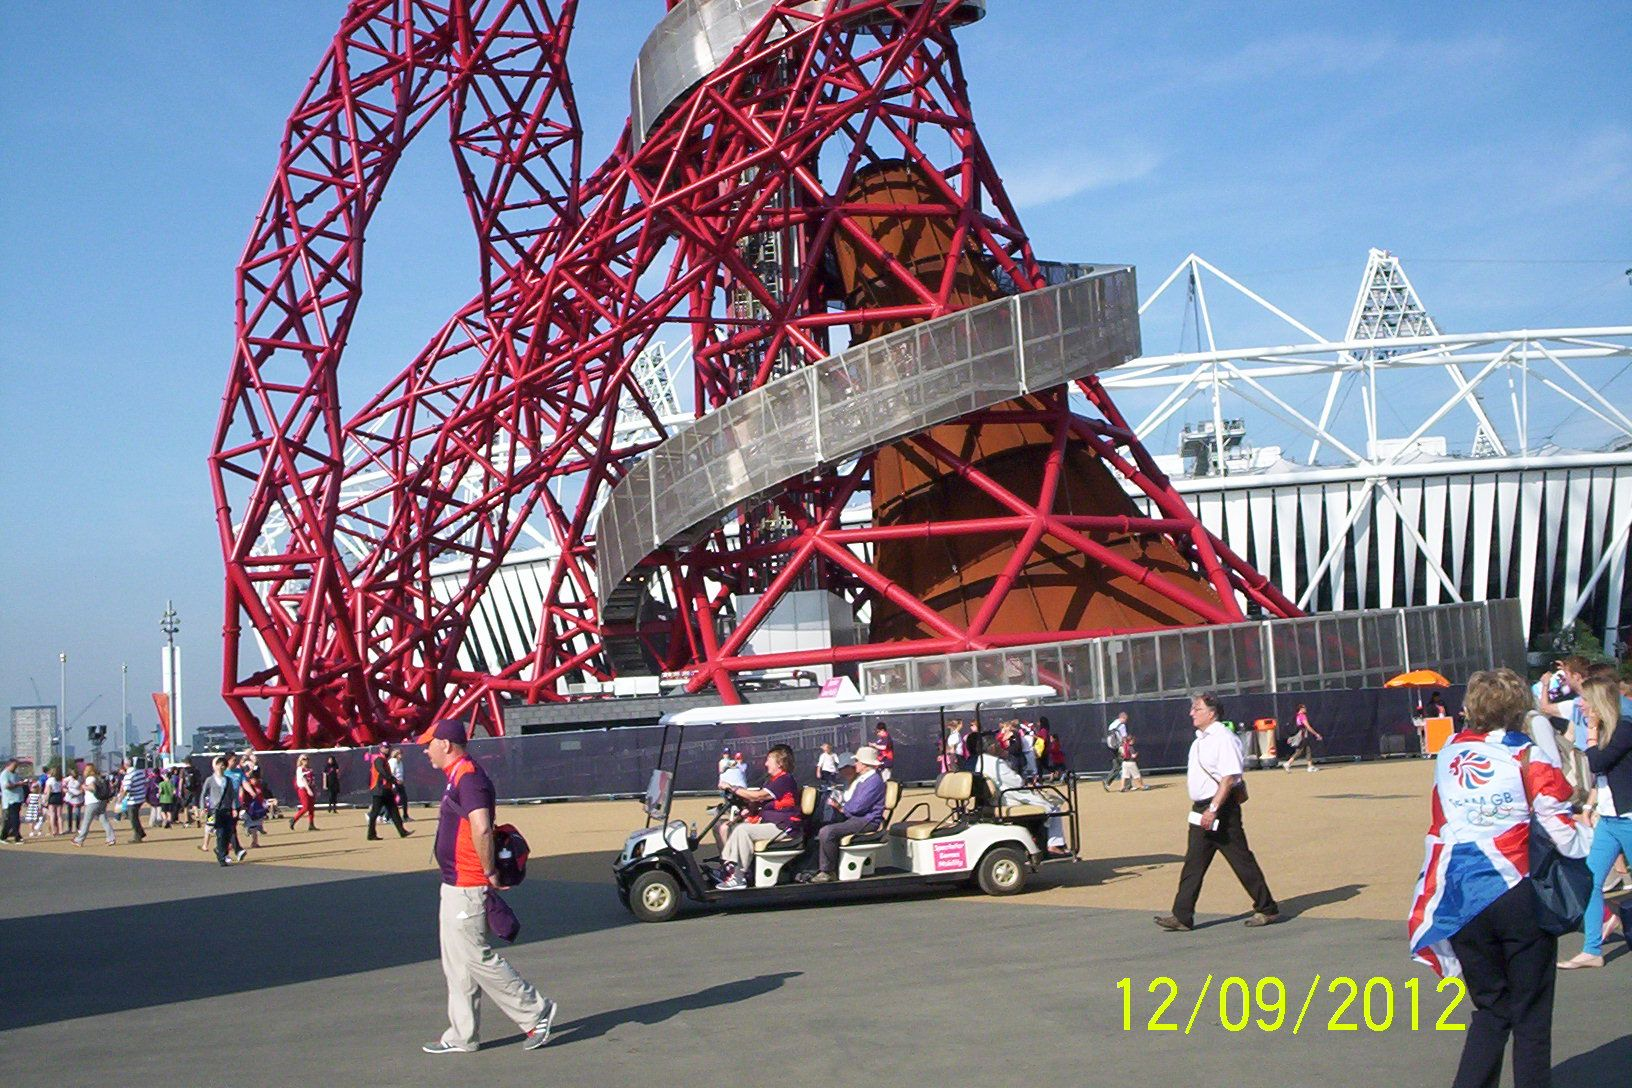 The Orbit and Olympic Stadium (Sept 3, 2012)